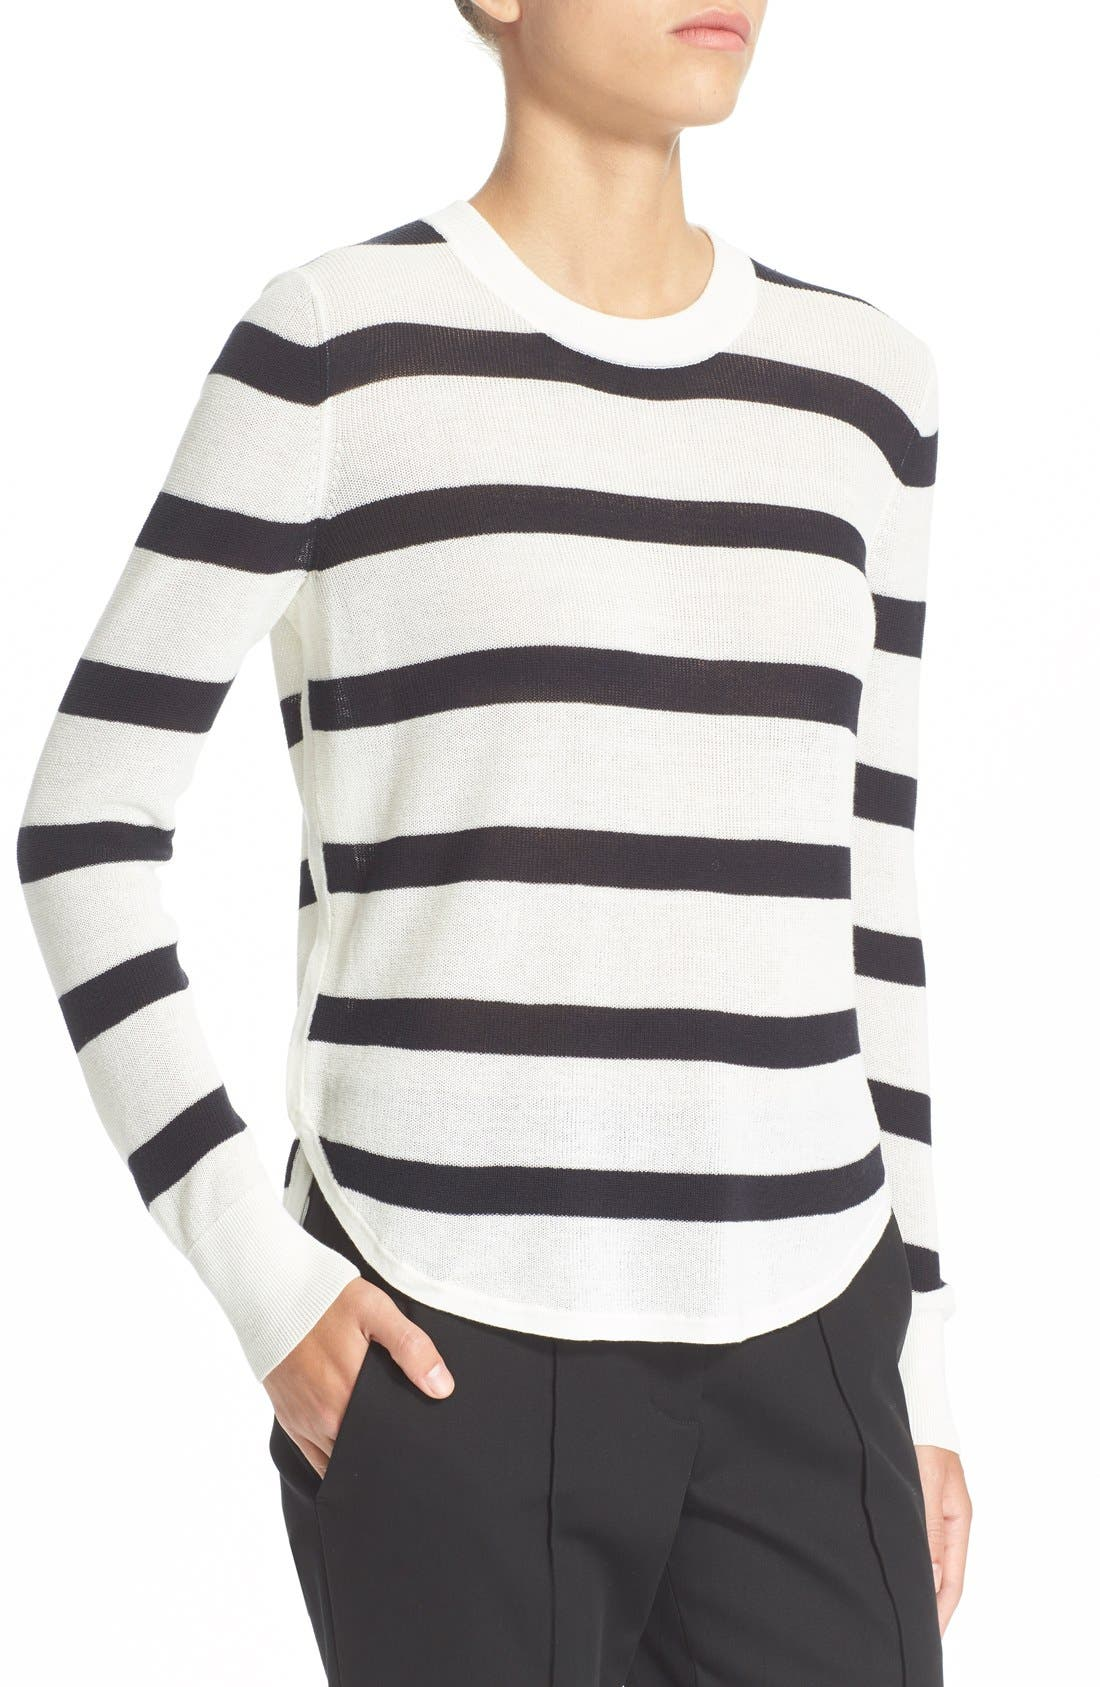 Alternate Image 1 Selected - A.L.C. 'Riley' Stripe Cotton Sweater